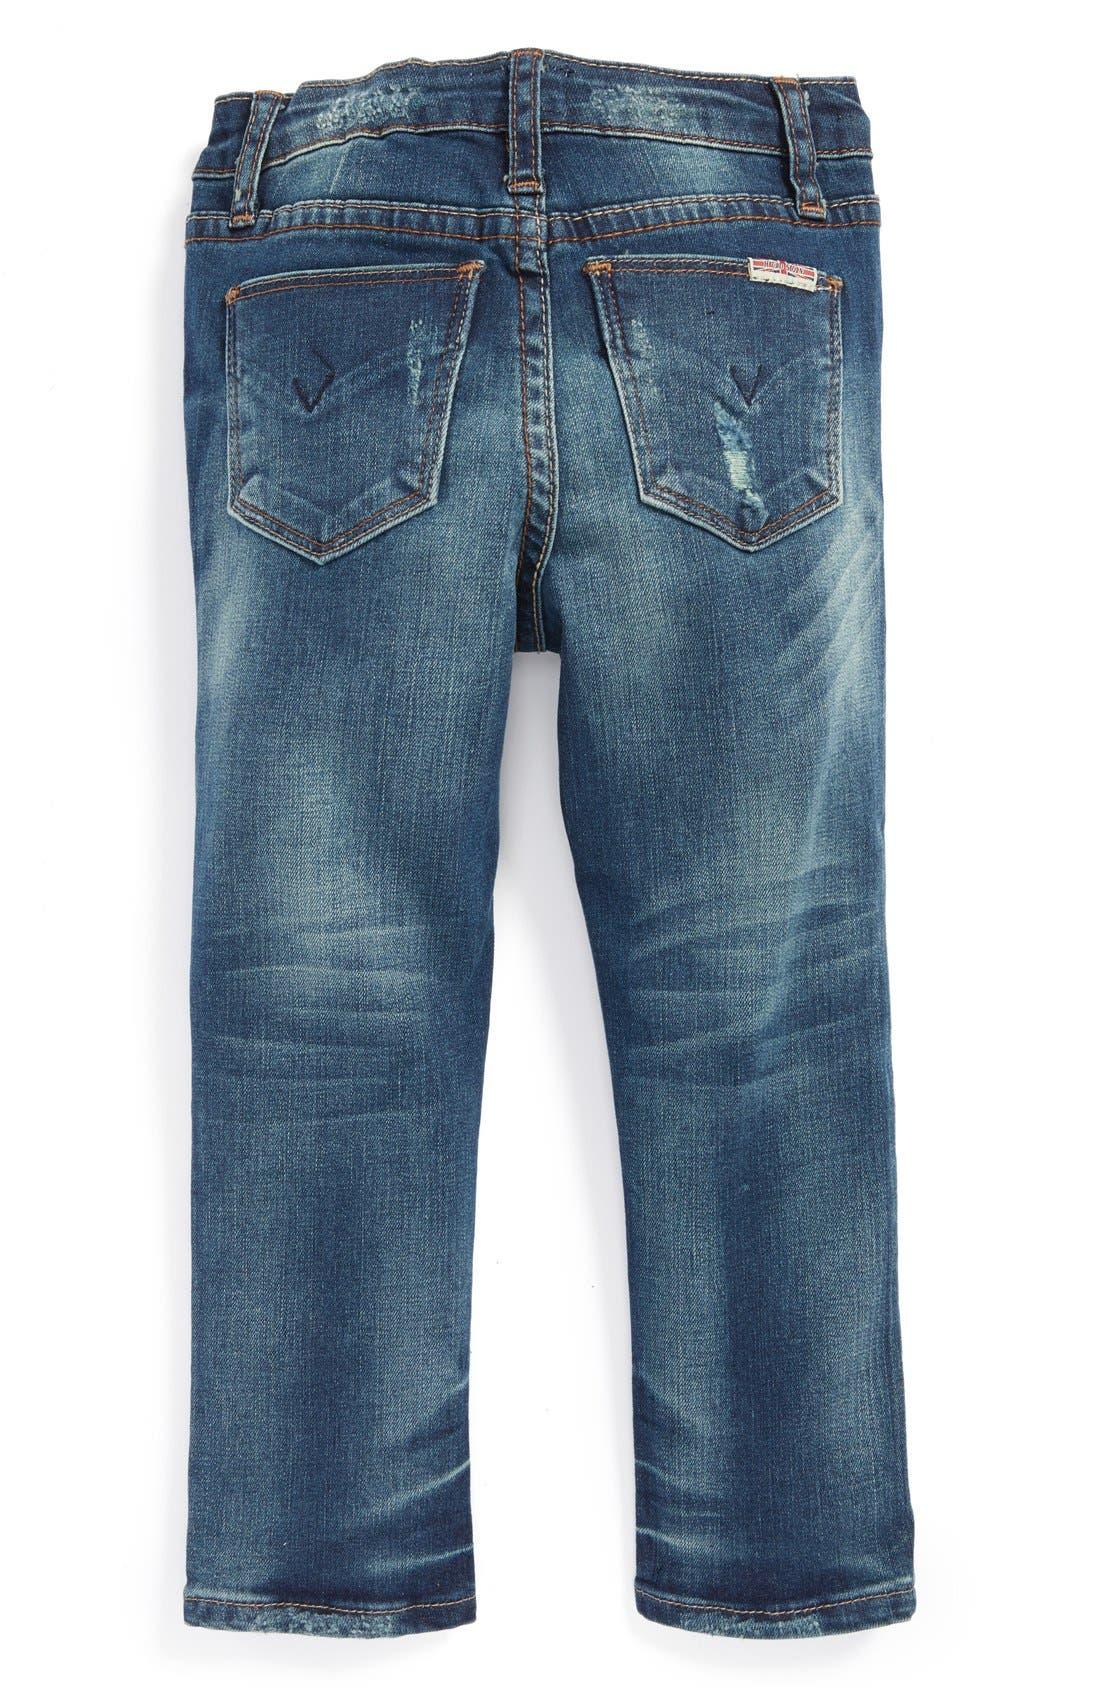 Main Image - Hudson Kids 'Dolly' Distressed Skinny Jeans (Toddler Girls)